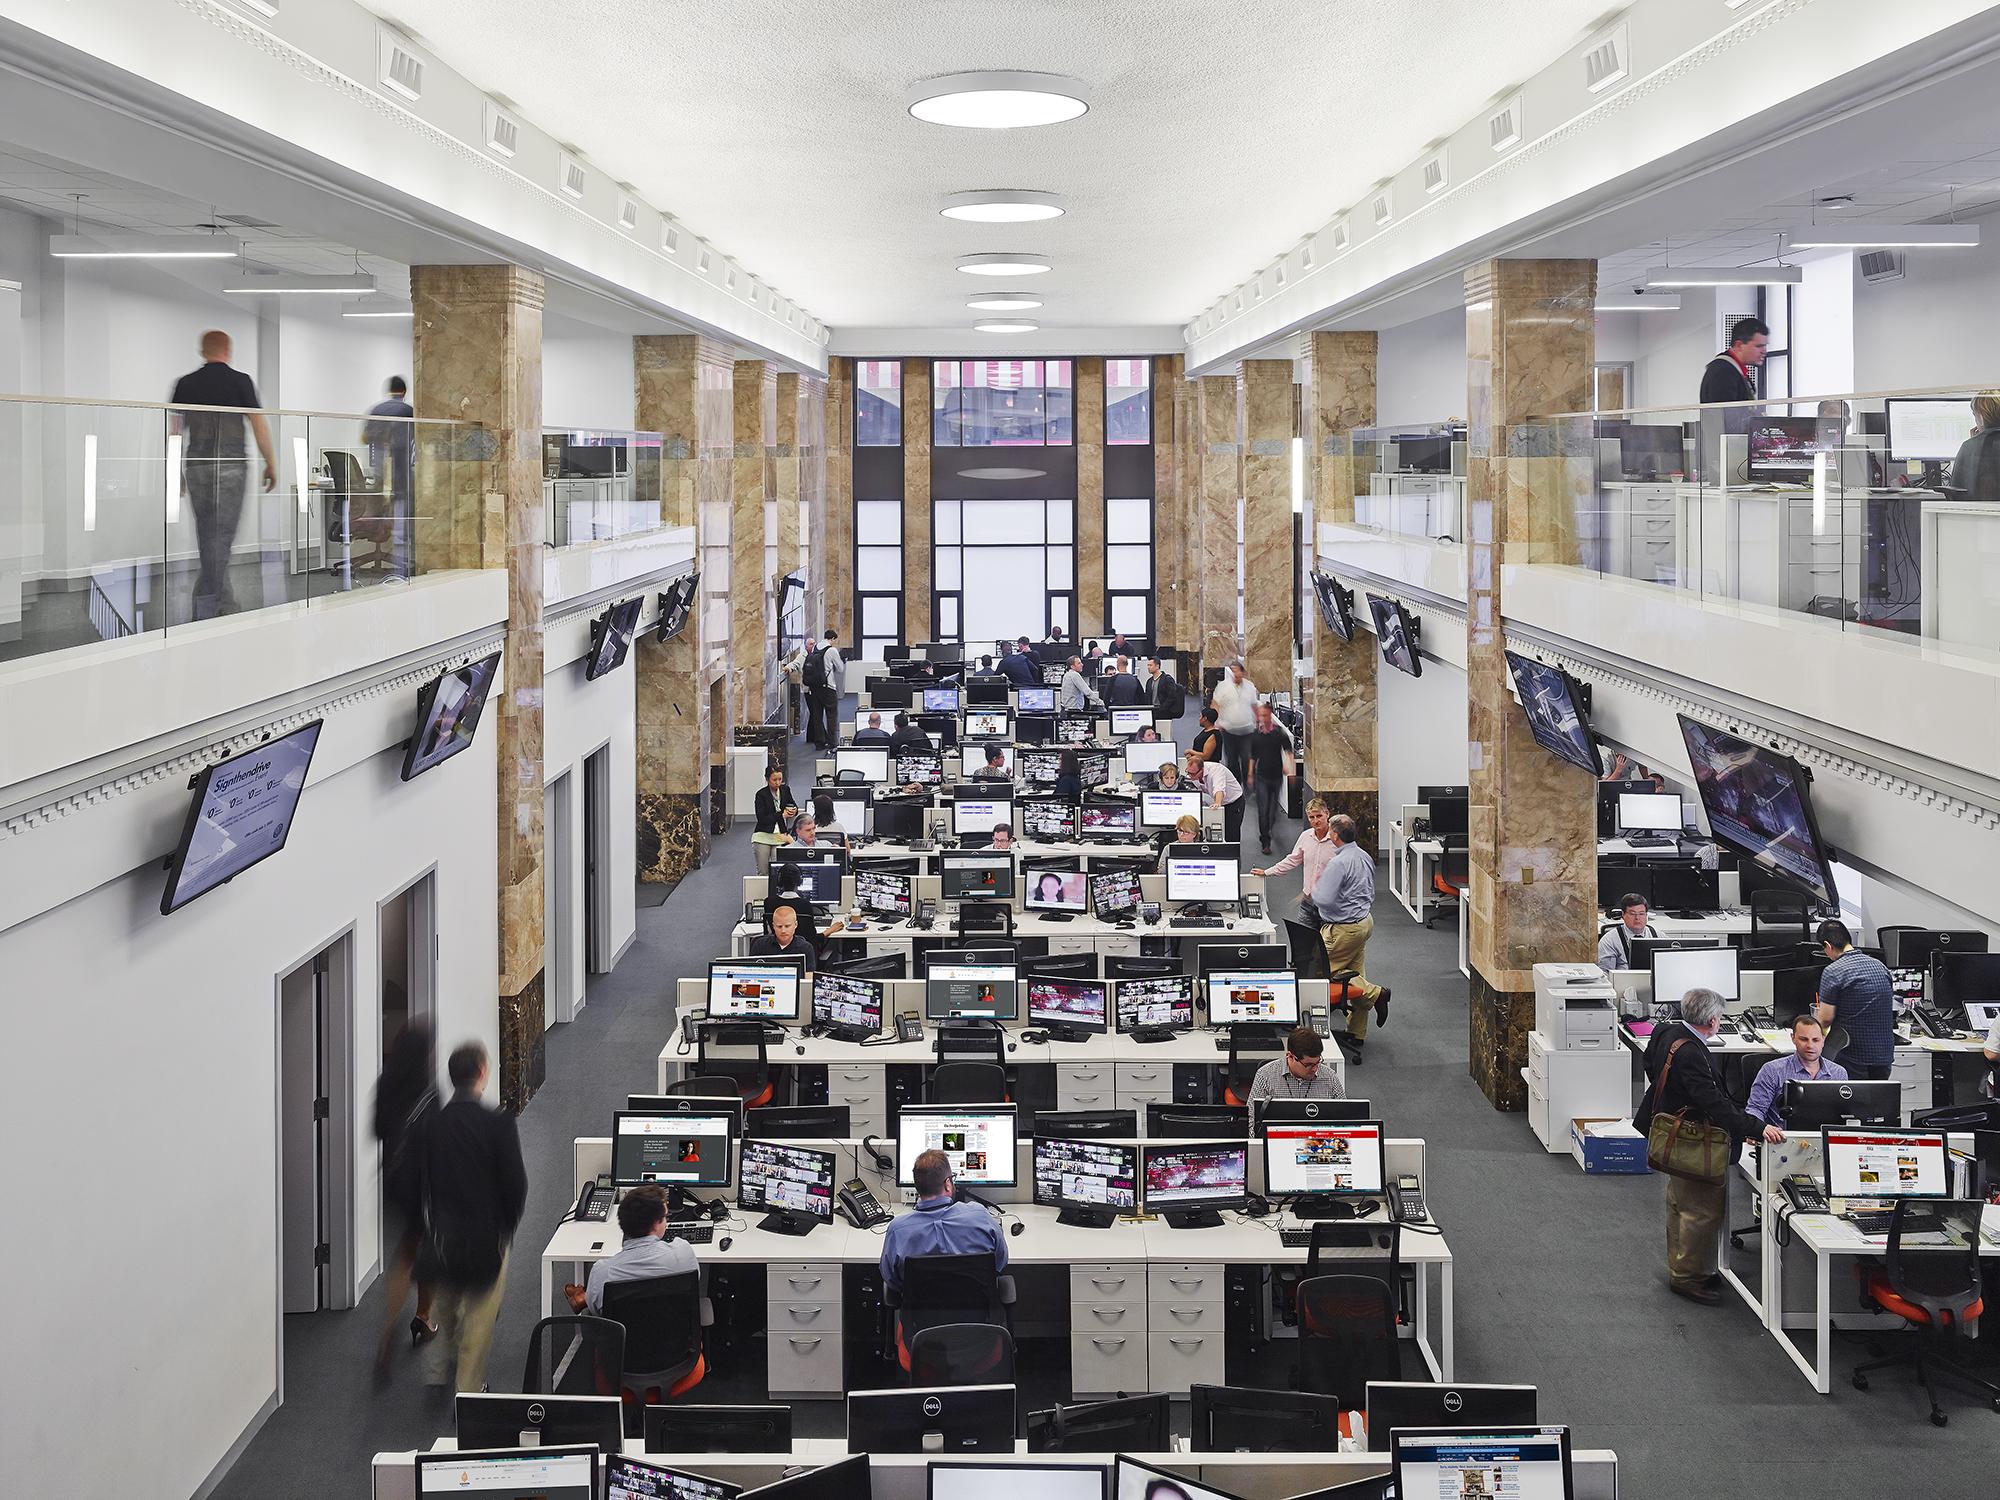 Al Jazeera Newsroom  The Lawrence Group